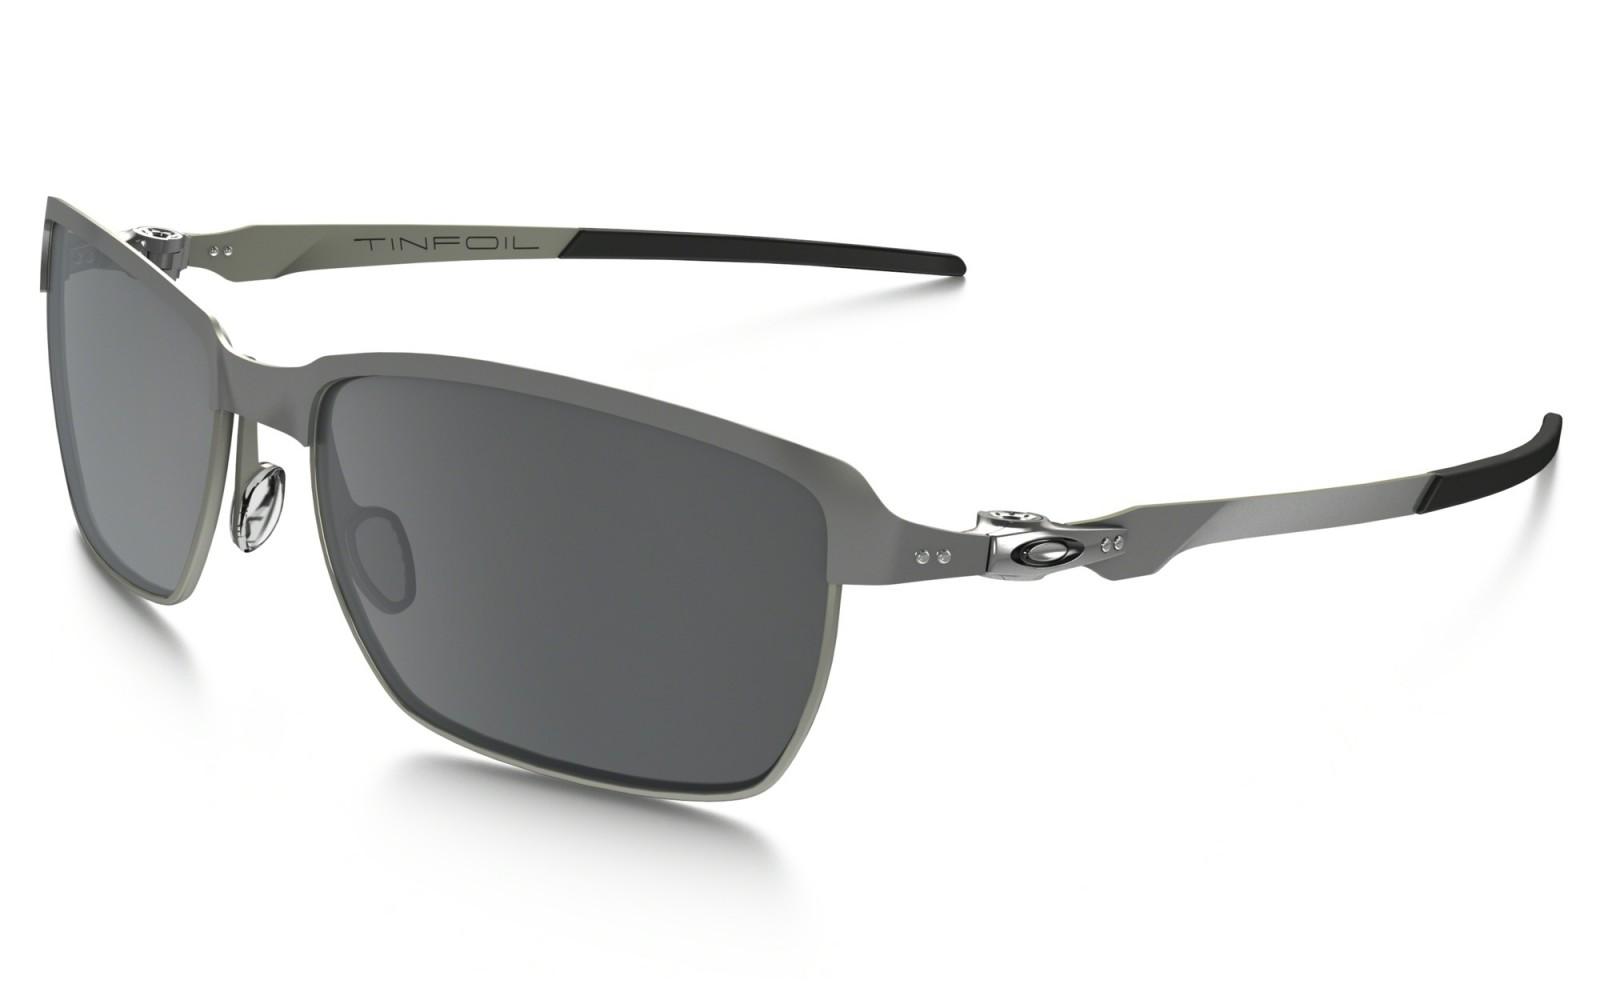 Oakley Tinfoil - Lead / Black Iridium - OO4083-02 Zonnebril